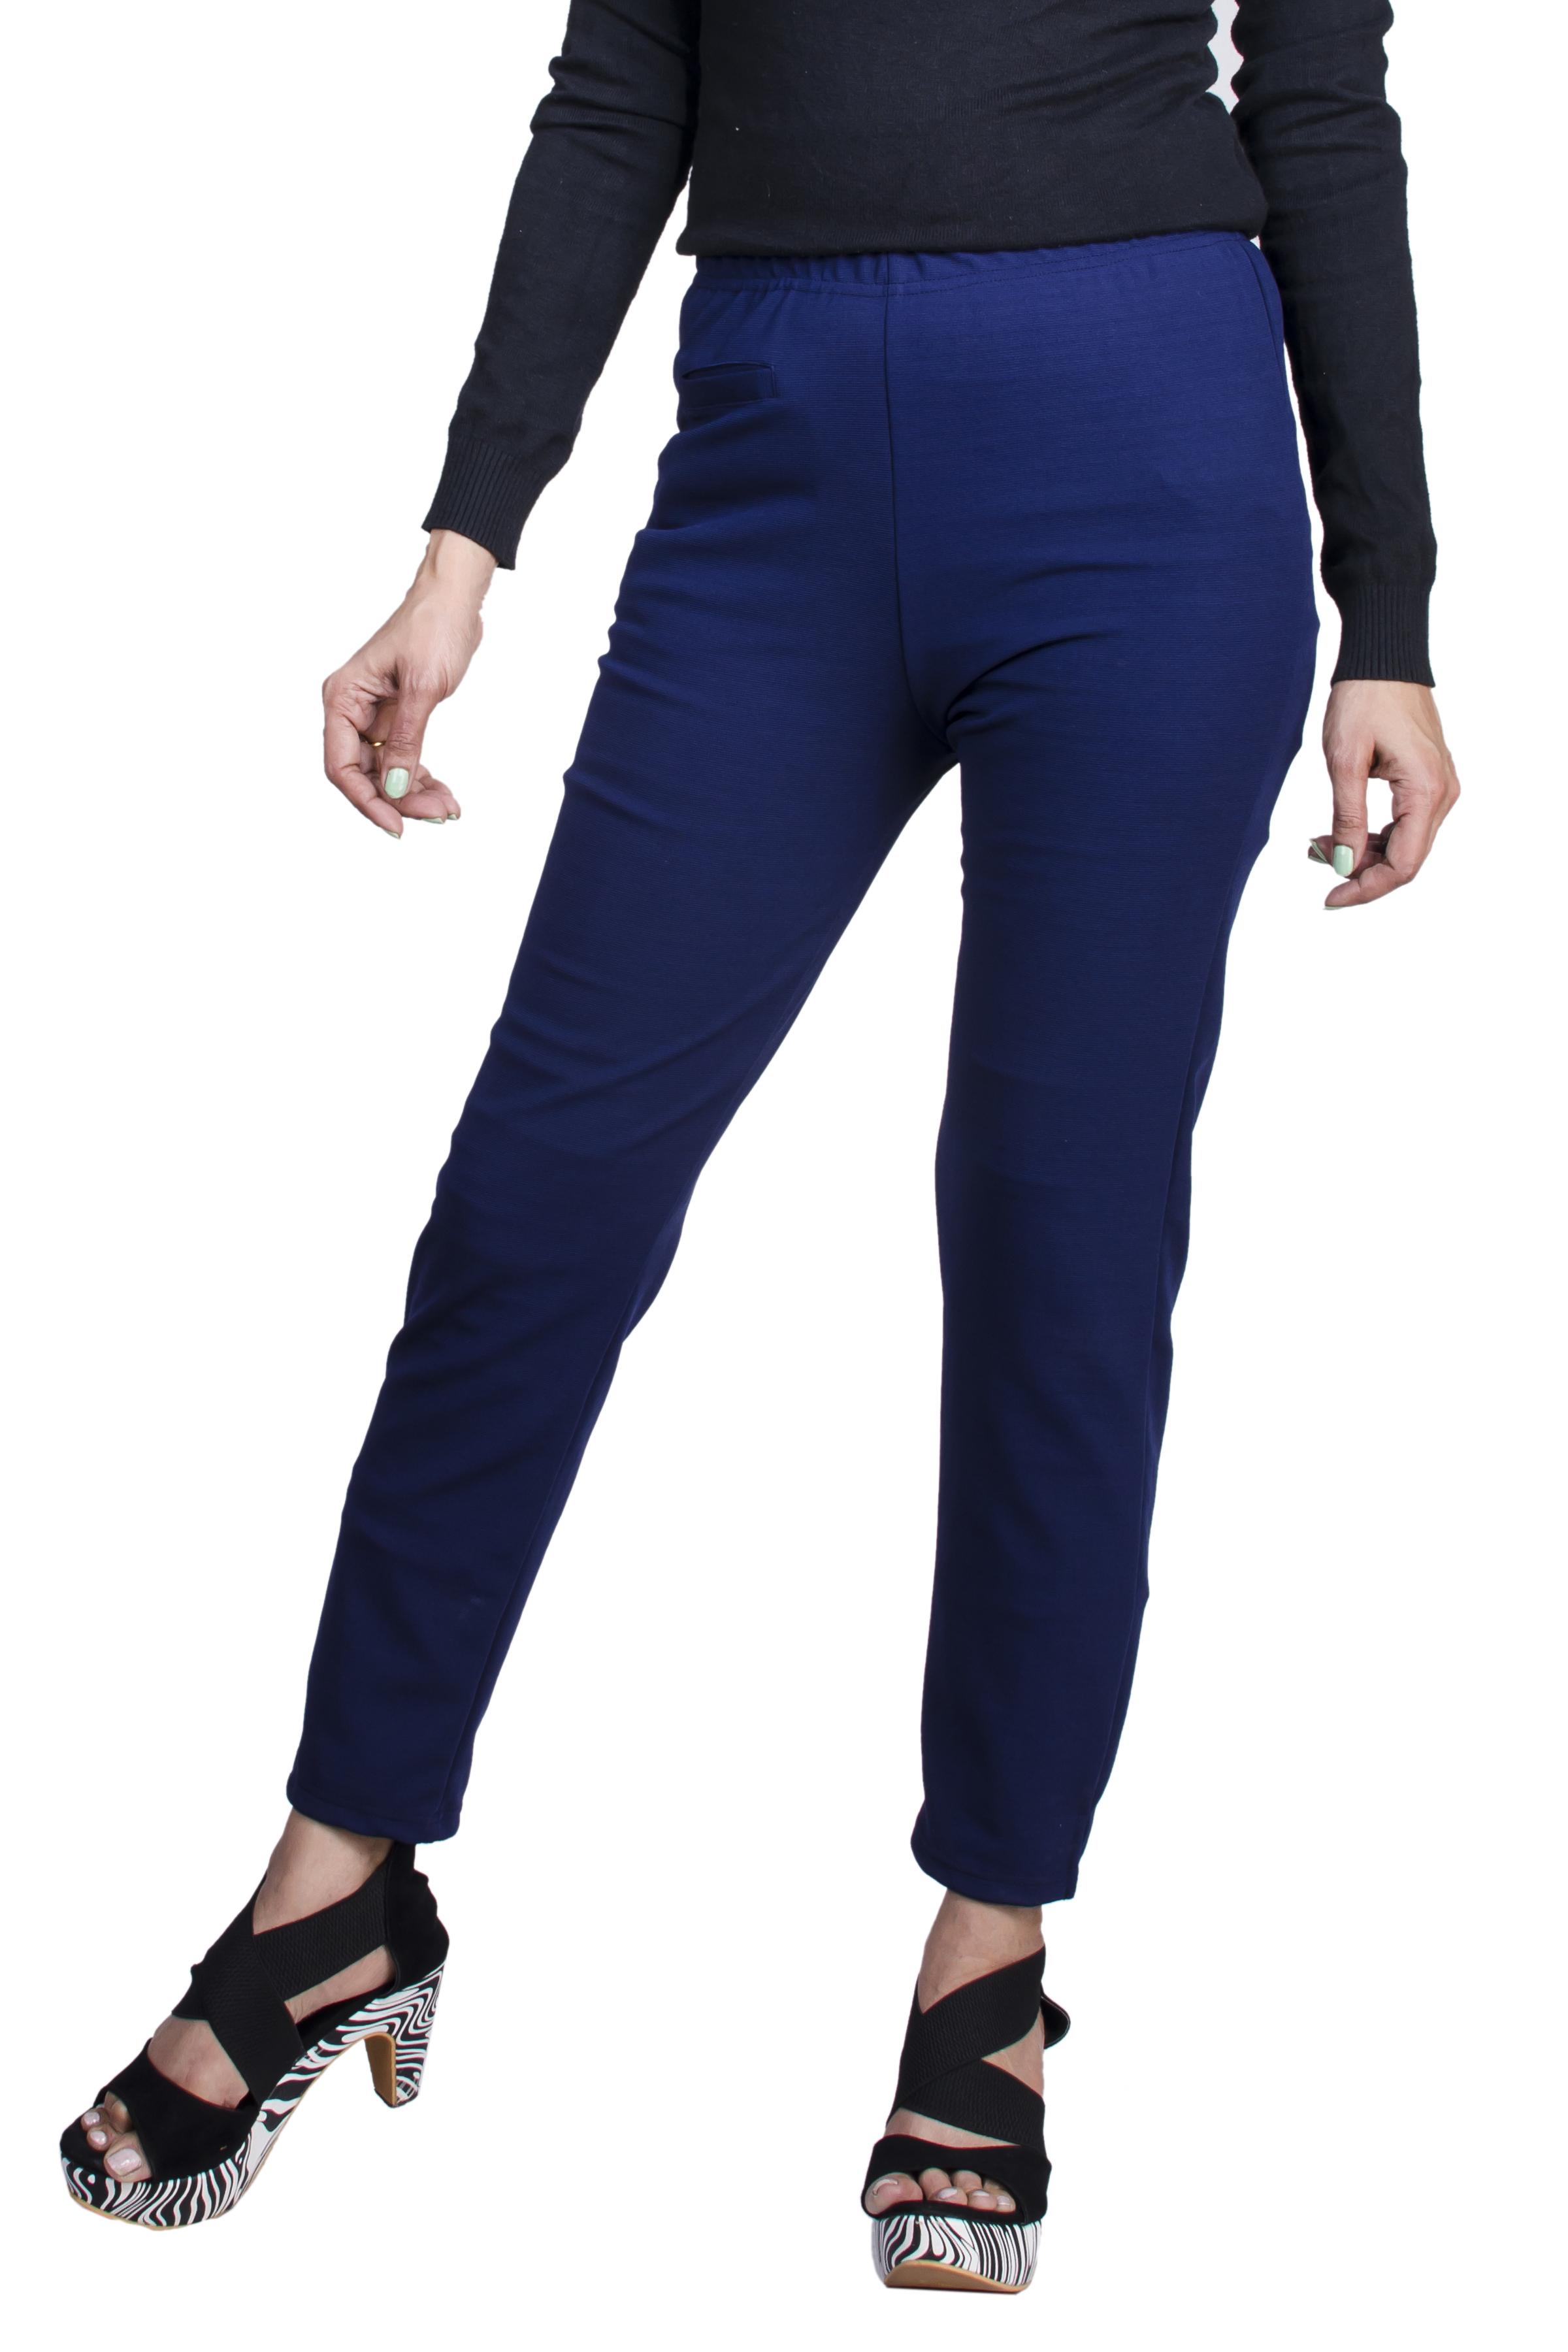 Stylish Trouser